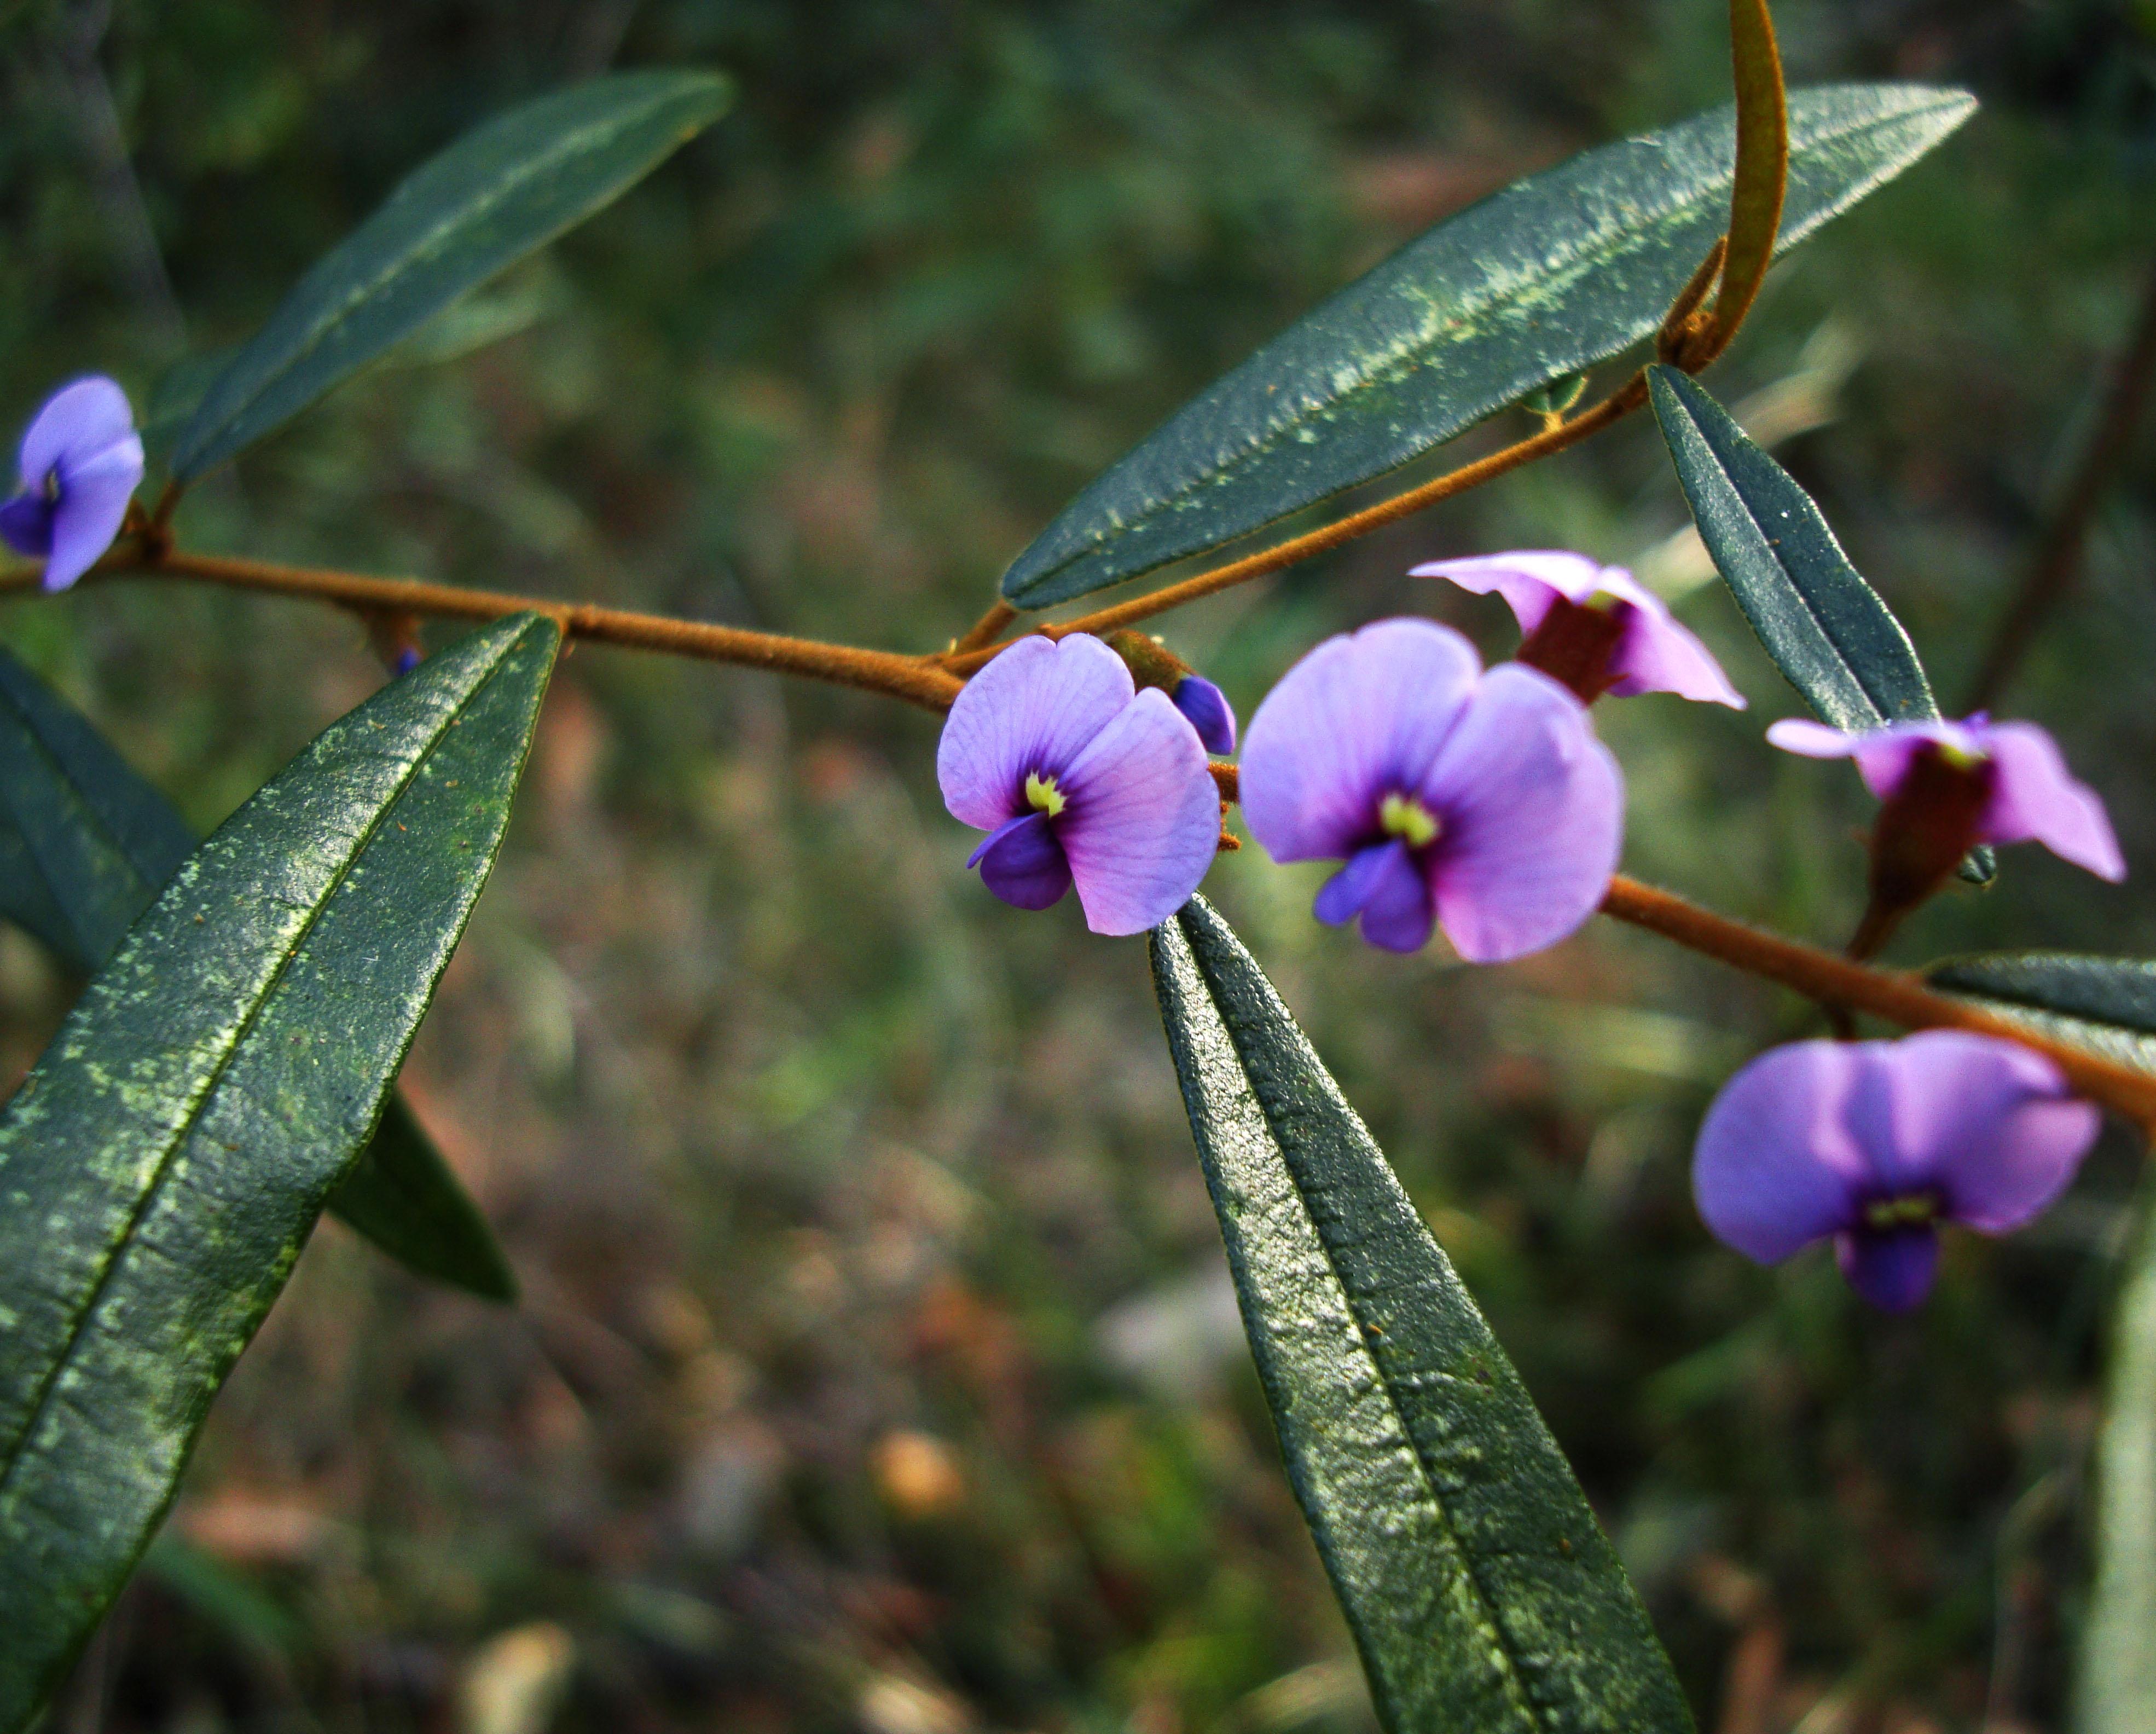 Tiny bush flowers Noosa National Park Qld Australia 27